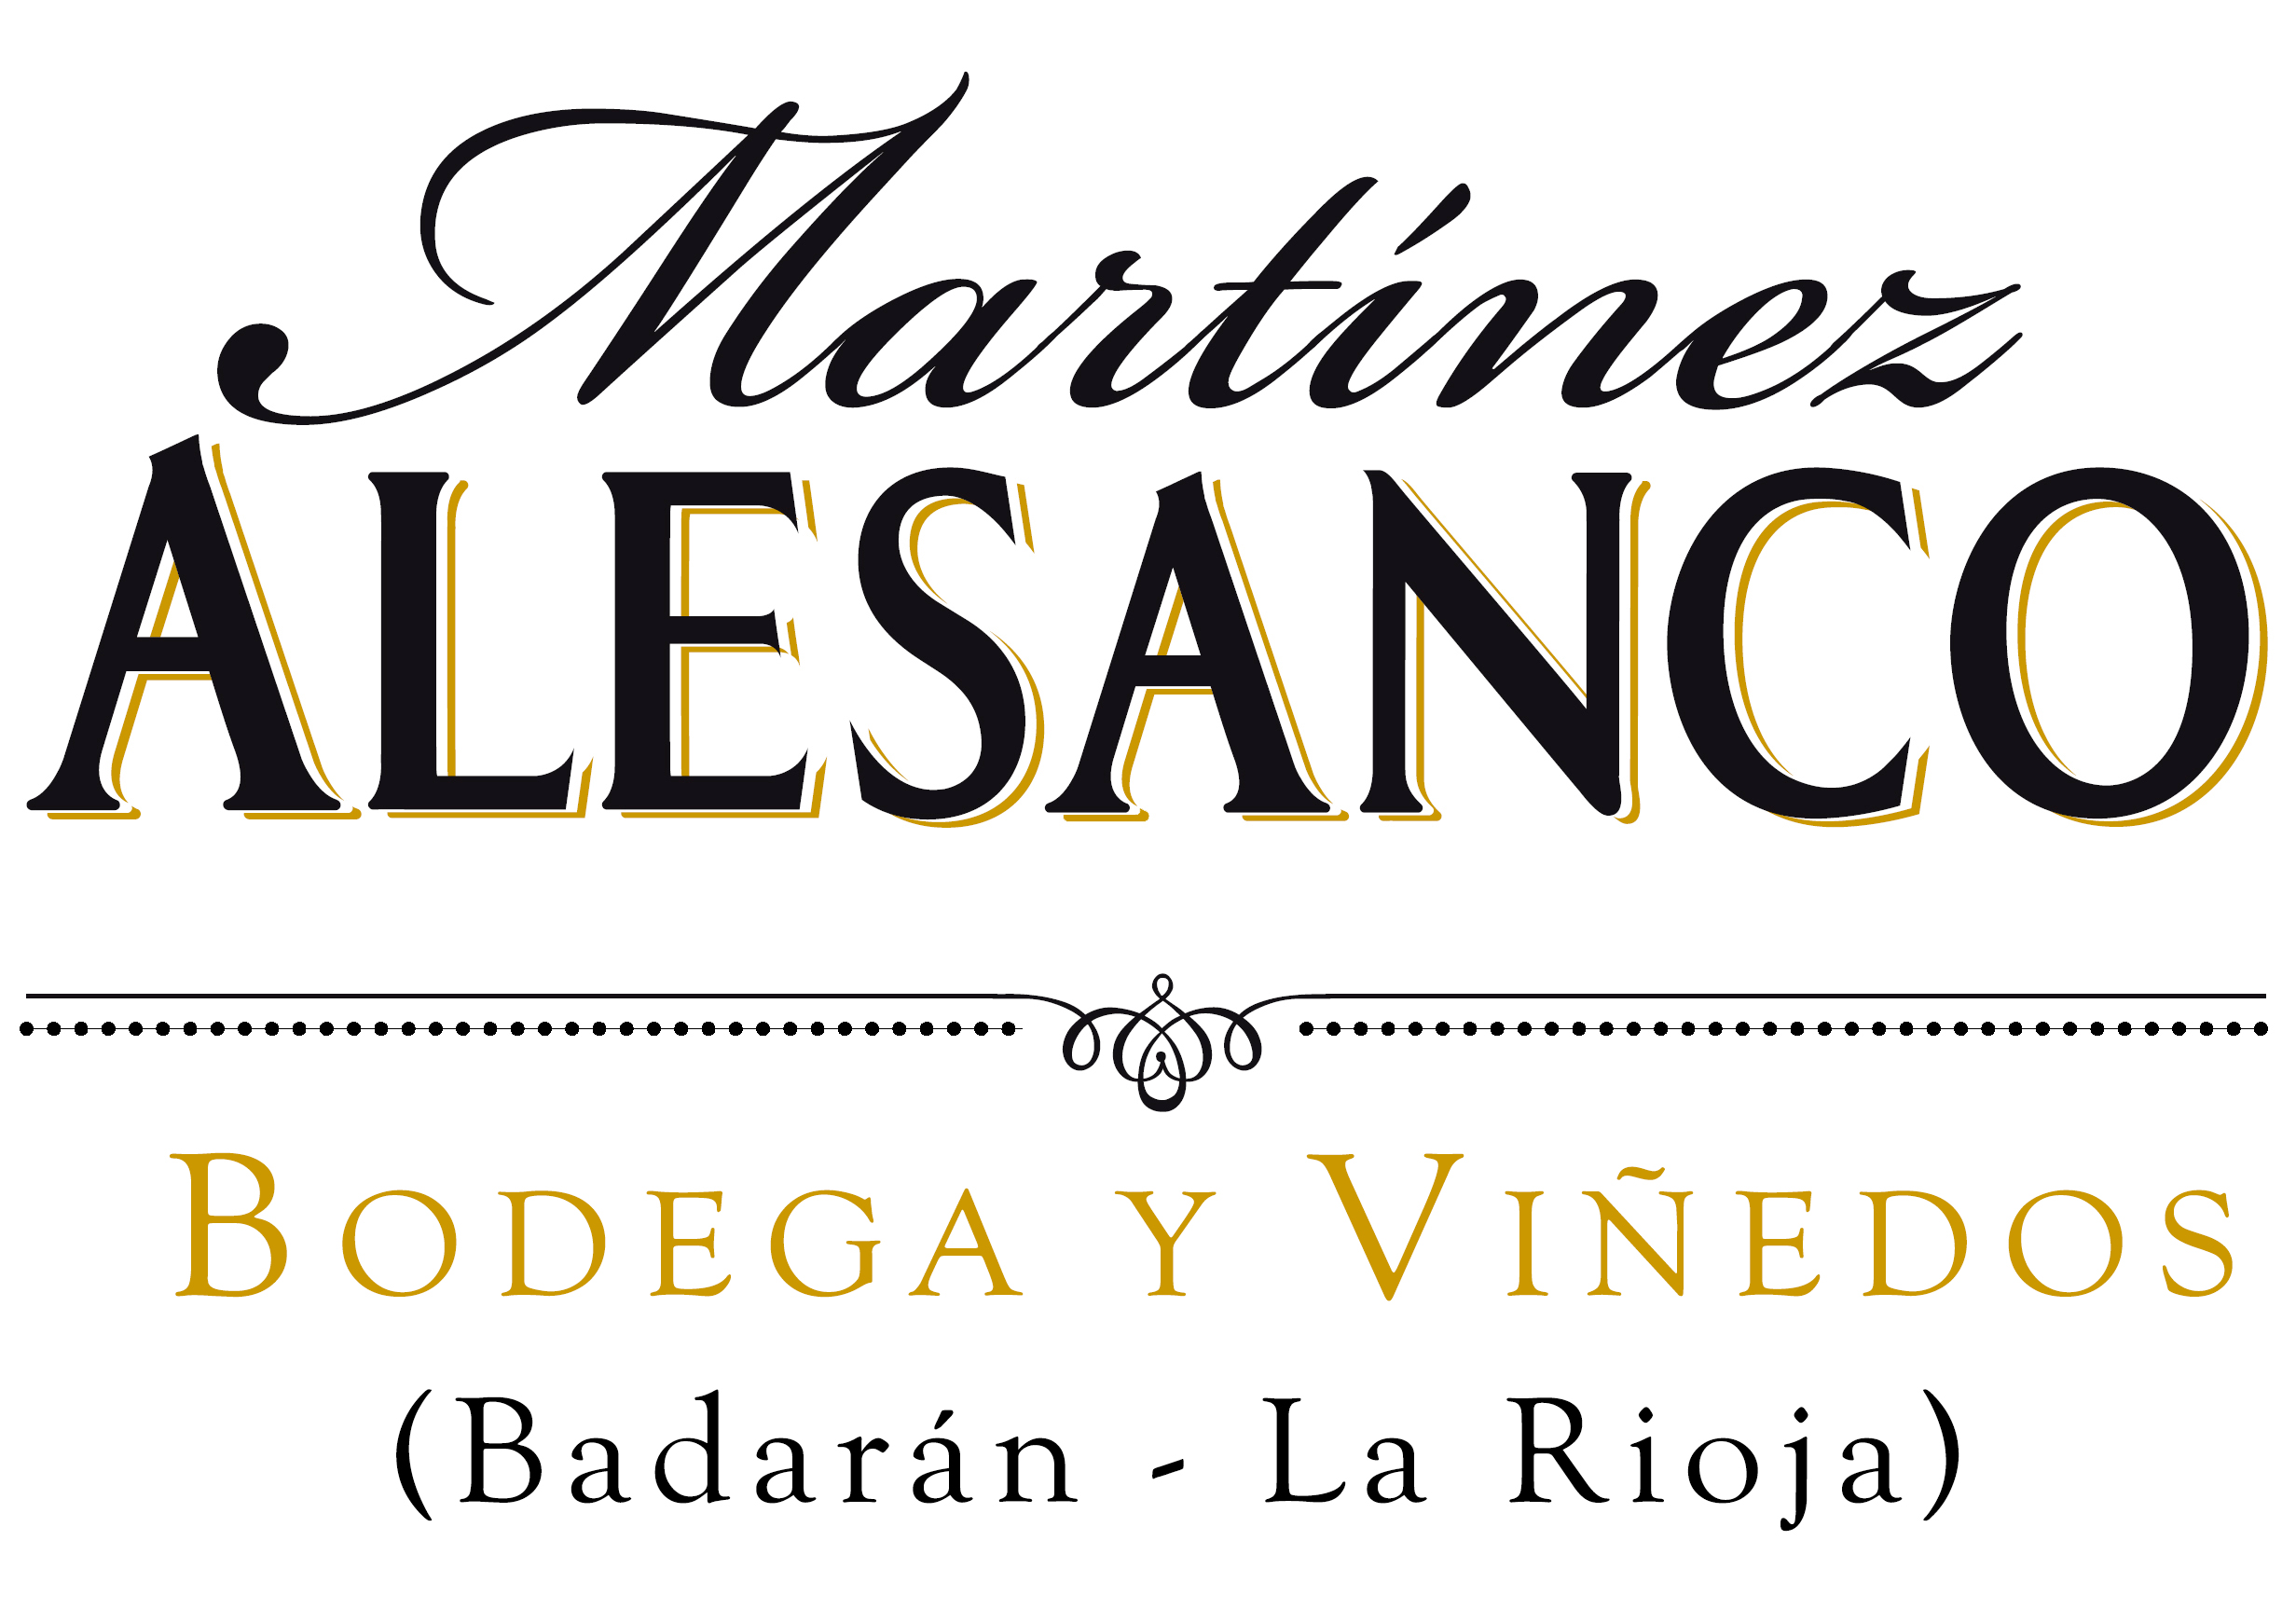 Bodegas Pedro Martinez Alesanco, S.L.